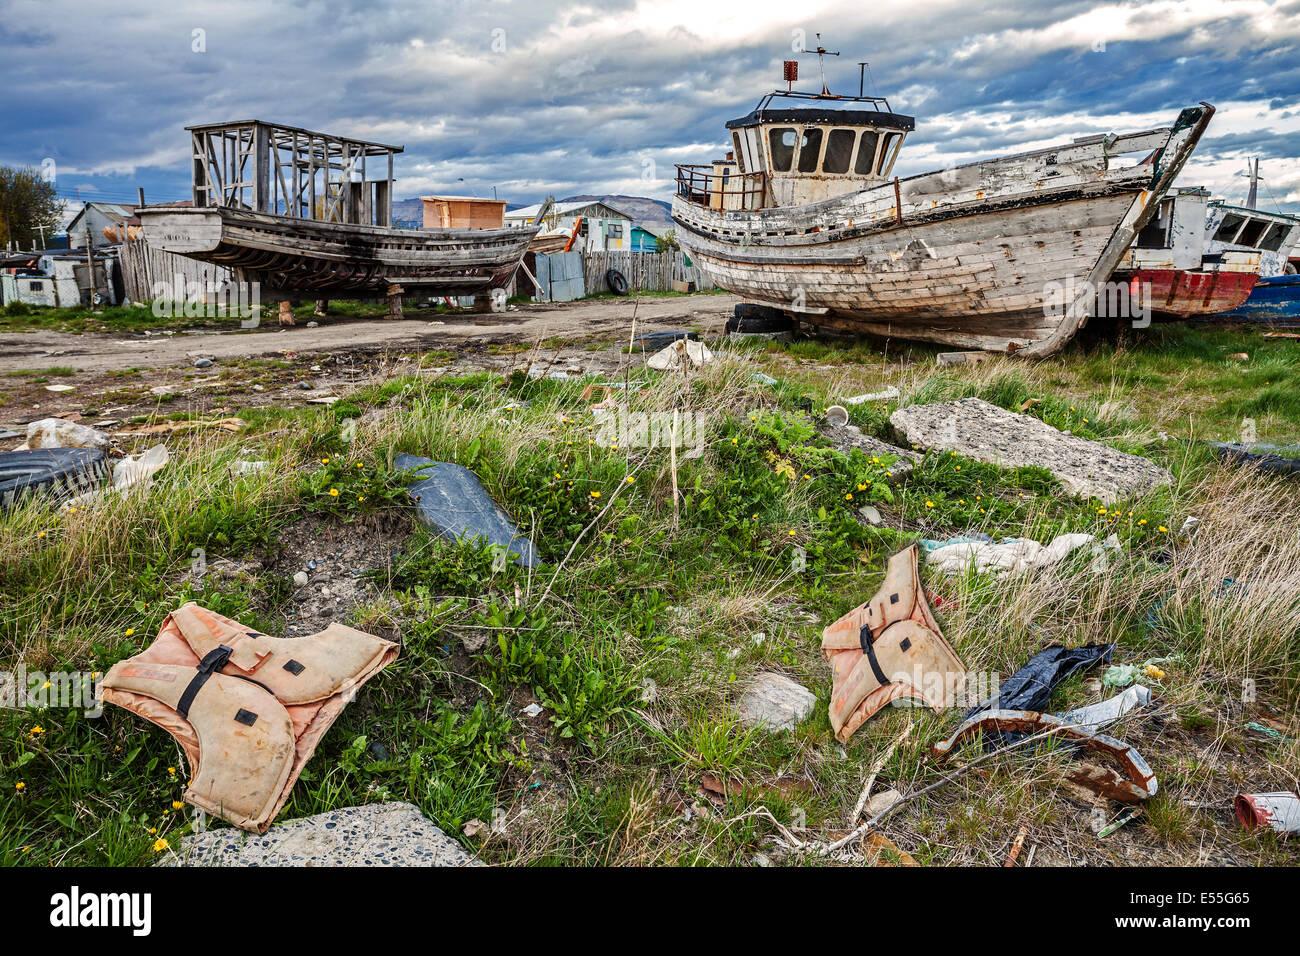 Old Boat Scrap Yard - Stock Image